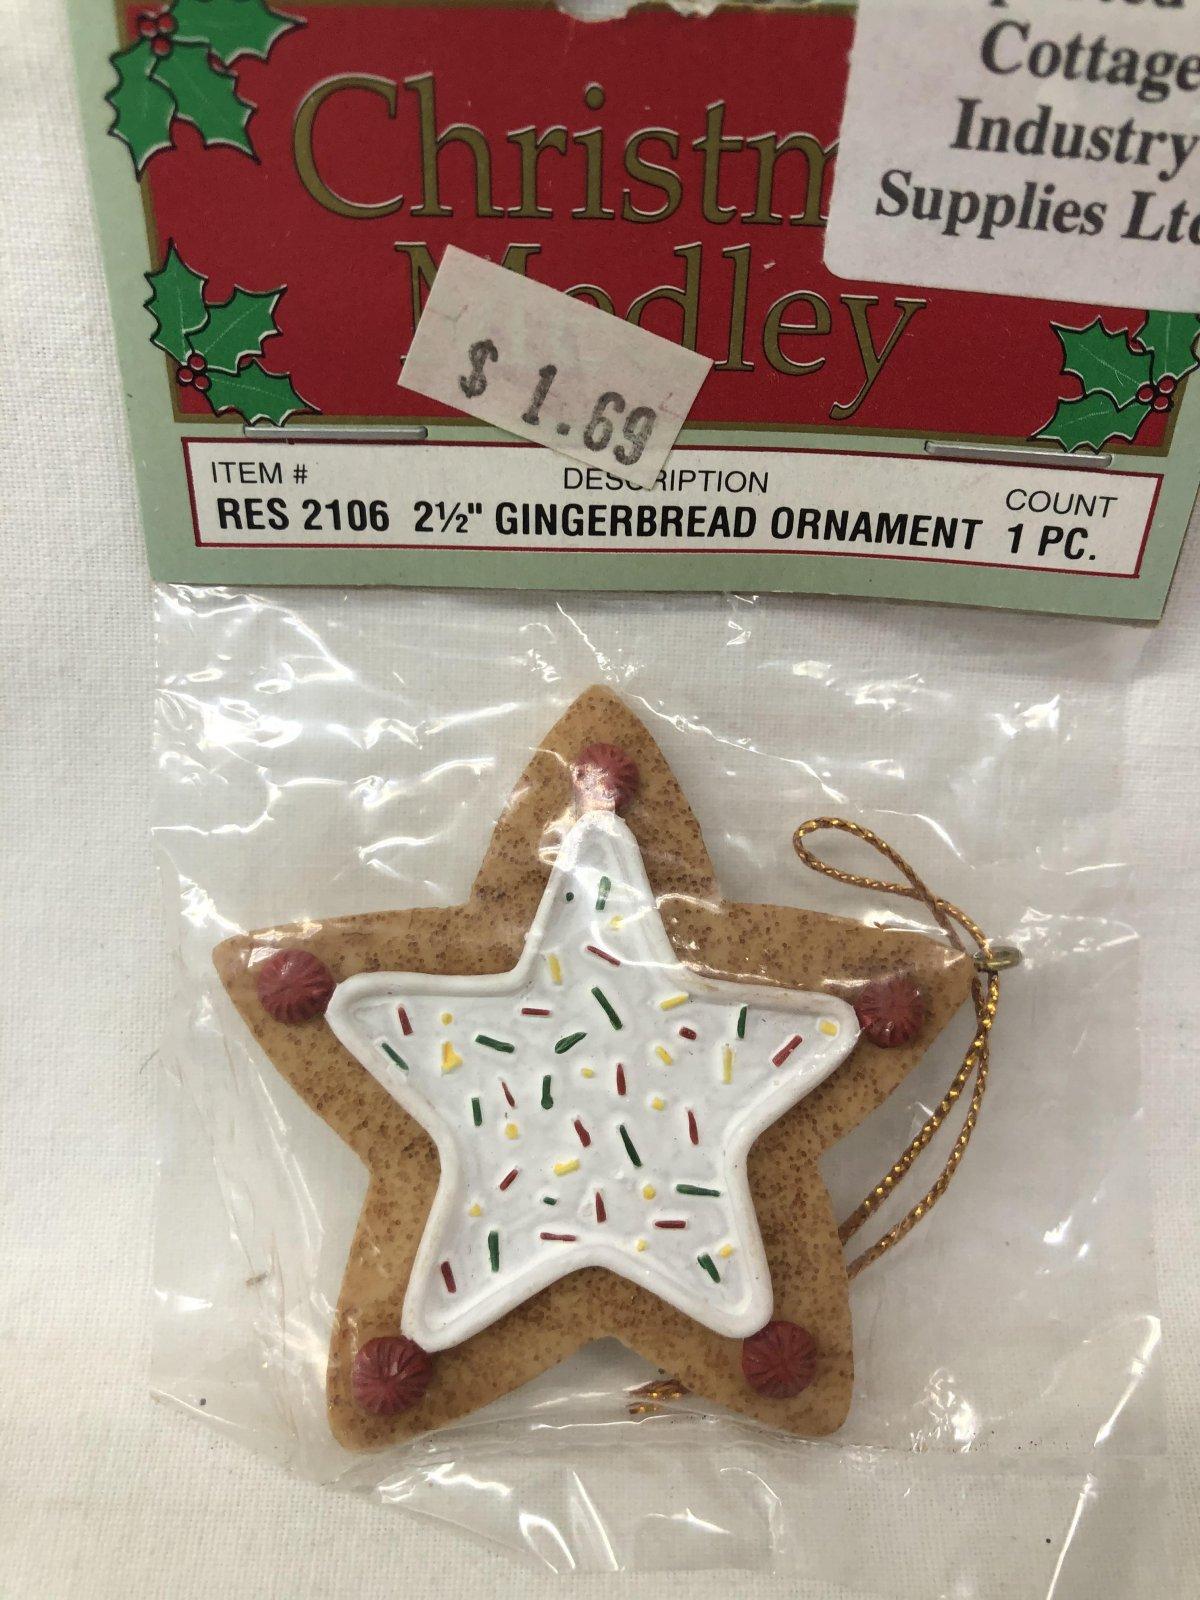 Christmas Medley Star Gingerbread Ornament 717656130592